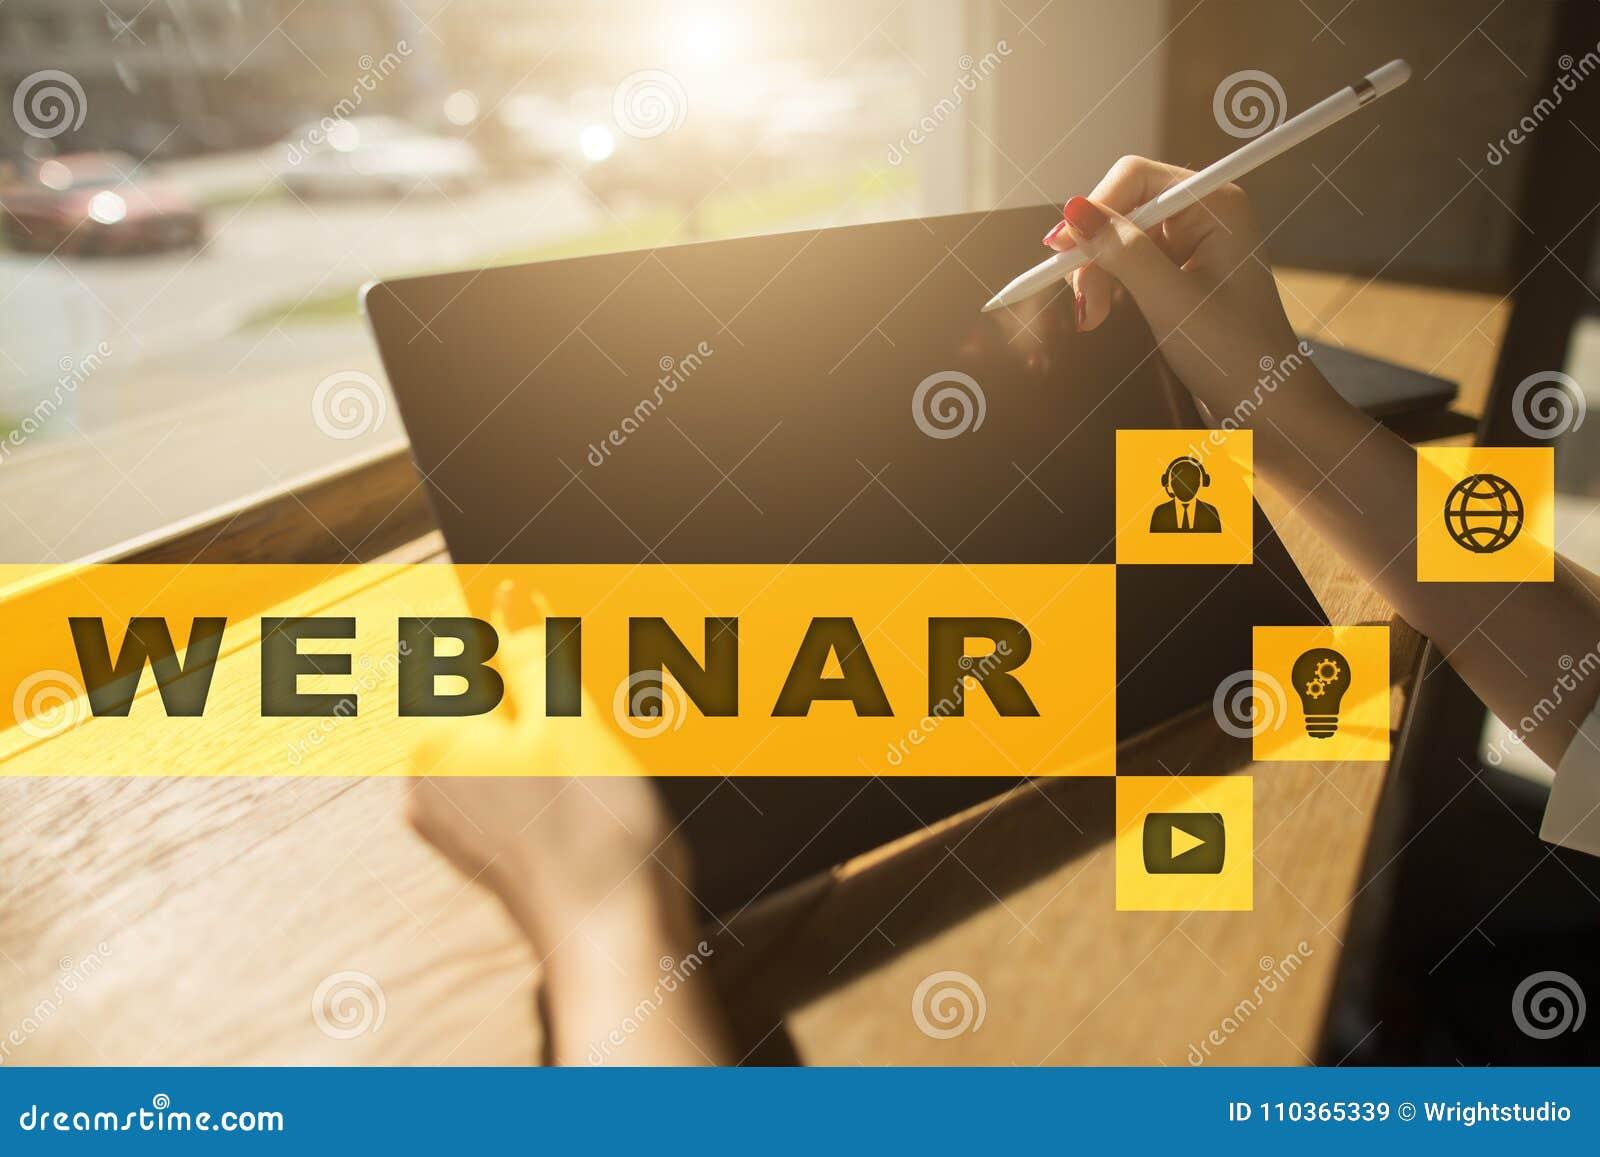 Webinar Обучение по Интернетуу, онлайн концепция образования развитие личное экран фактически